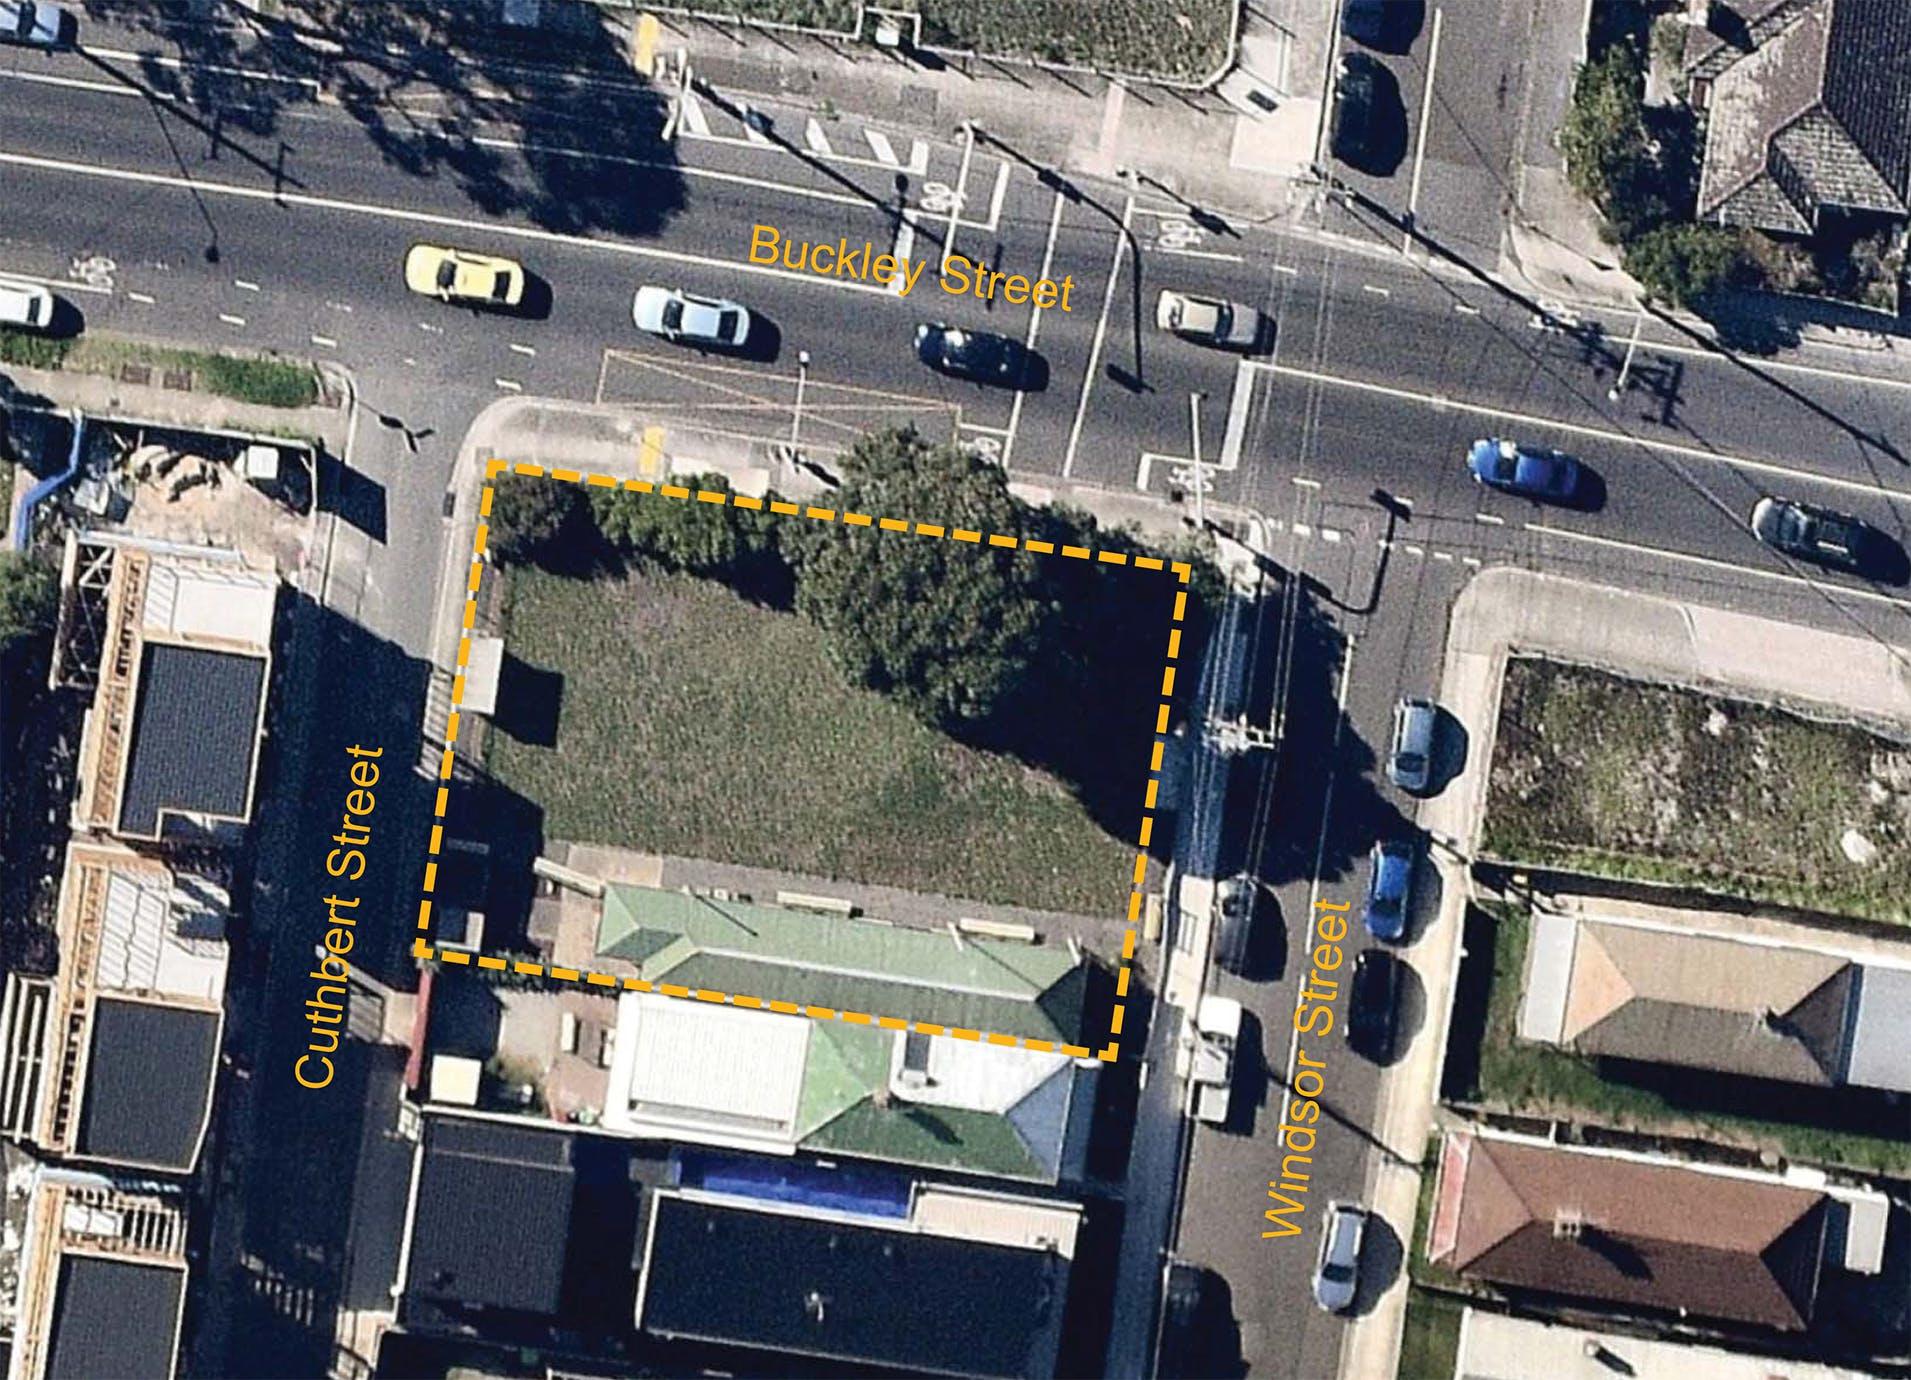 Aerial view - 139 Buckley Street, Seddon